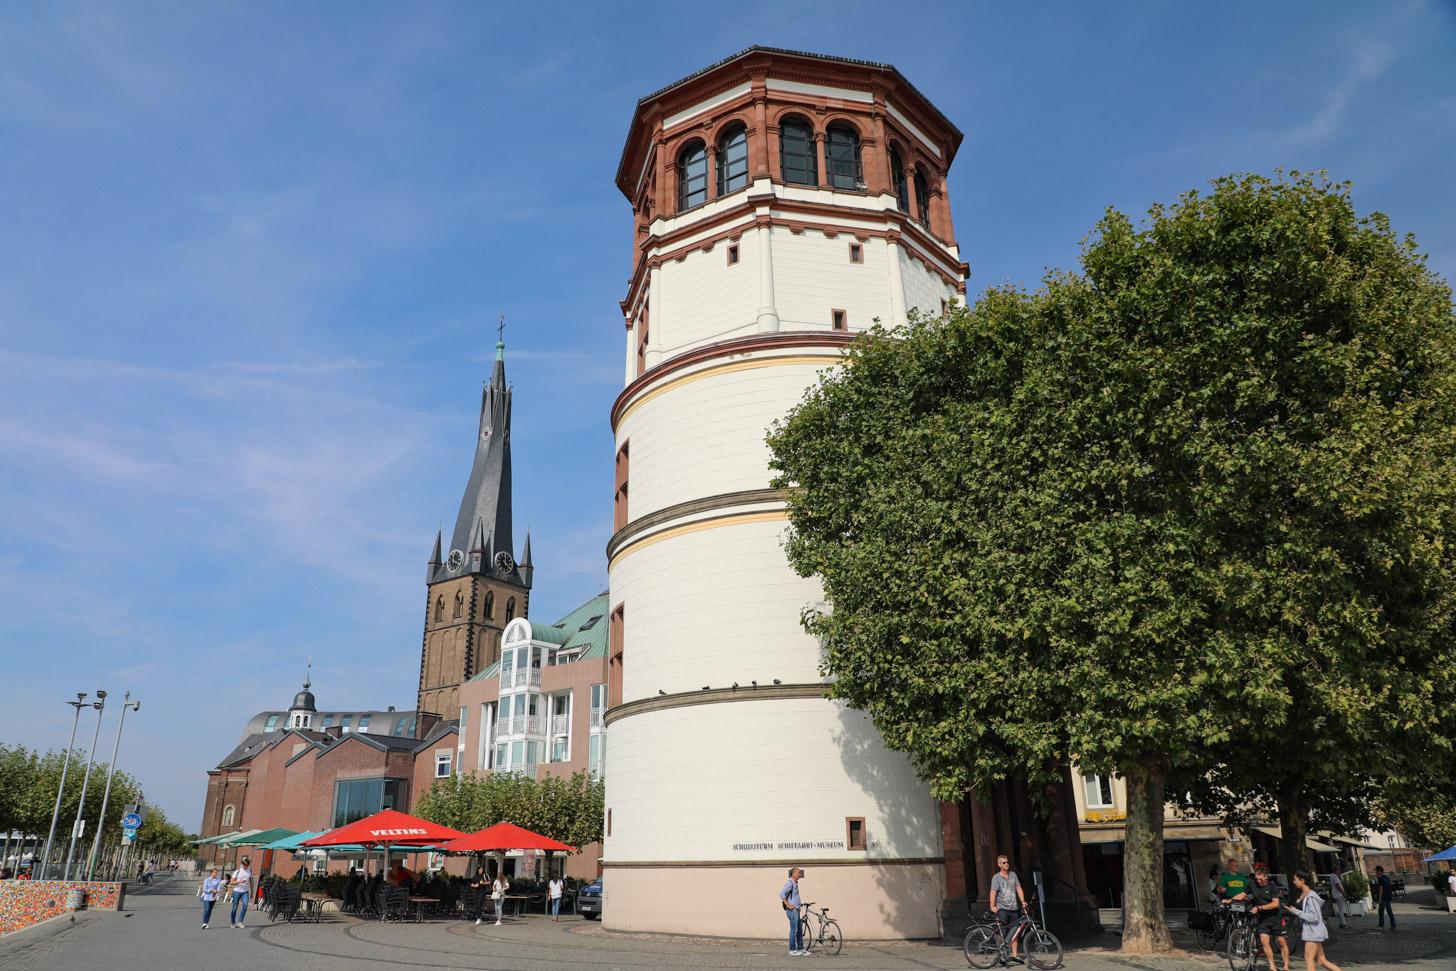 Shifffahrtmuseum